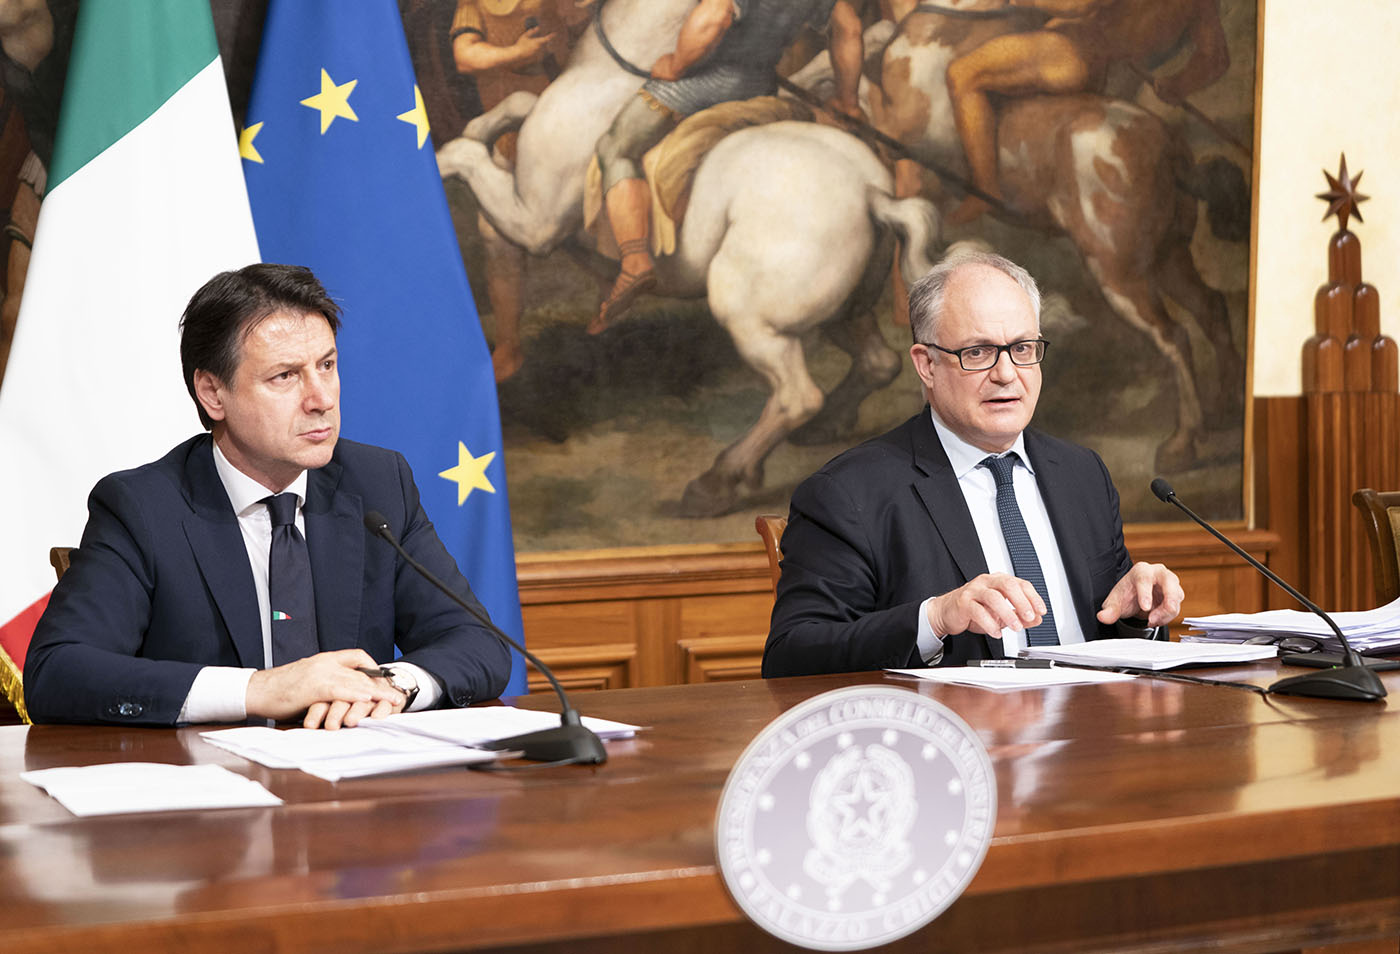 Il Domani di Feltri揭示了恢復計劃中孔戴和古埃蒂的失敗